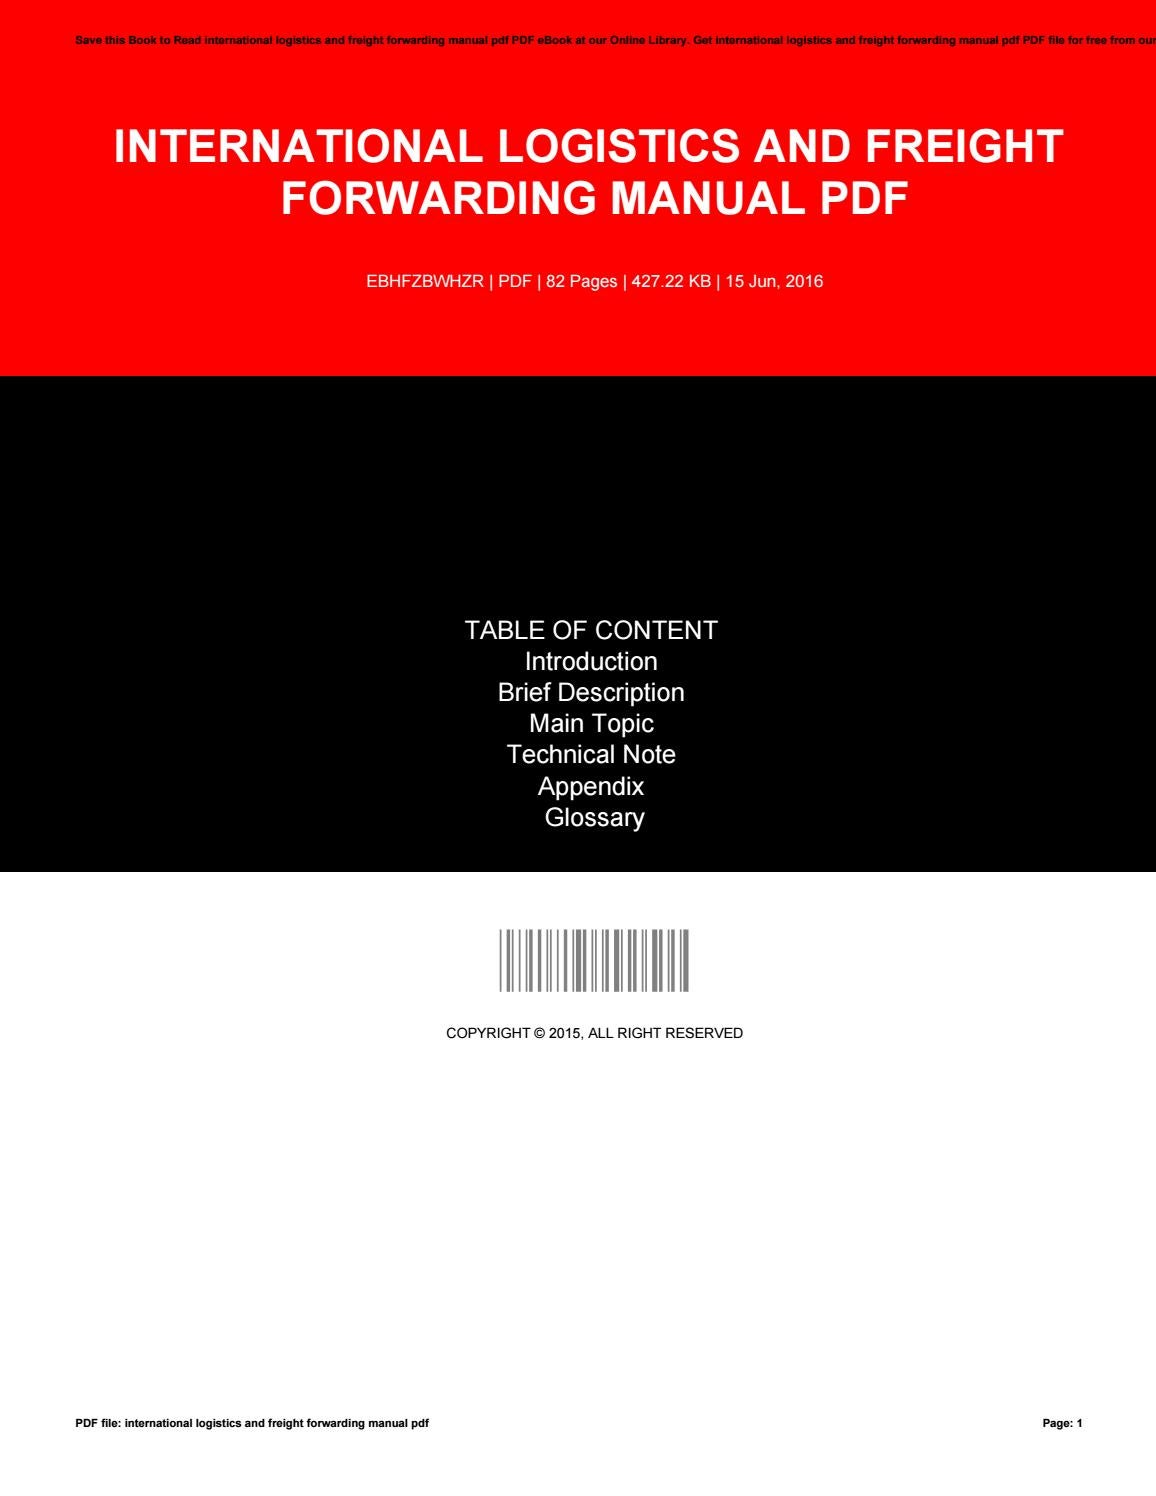 International logistics and freight forwarding manual pdf by e666 - issuu